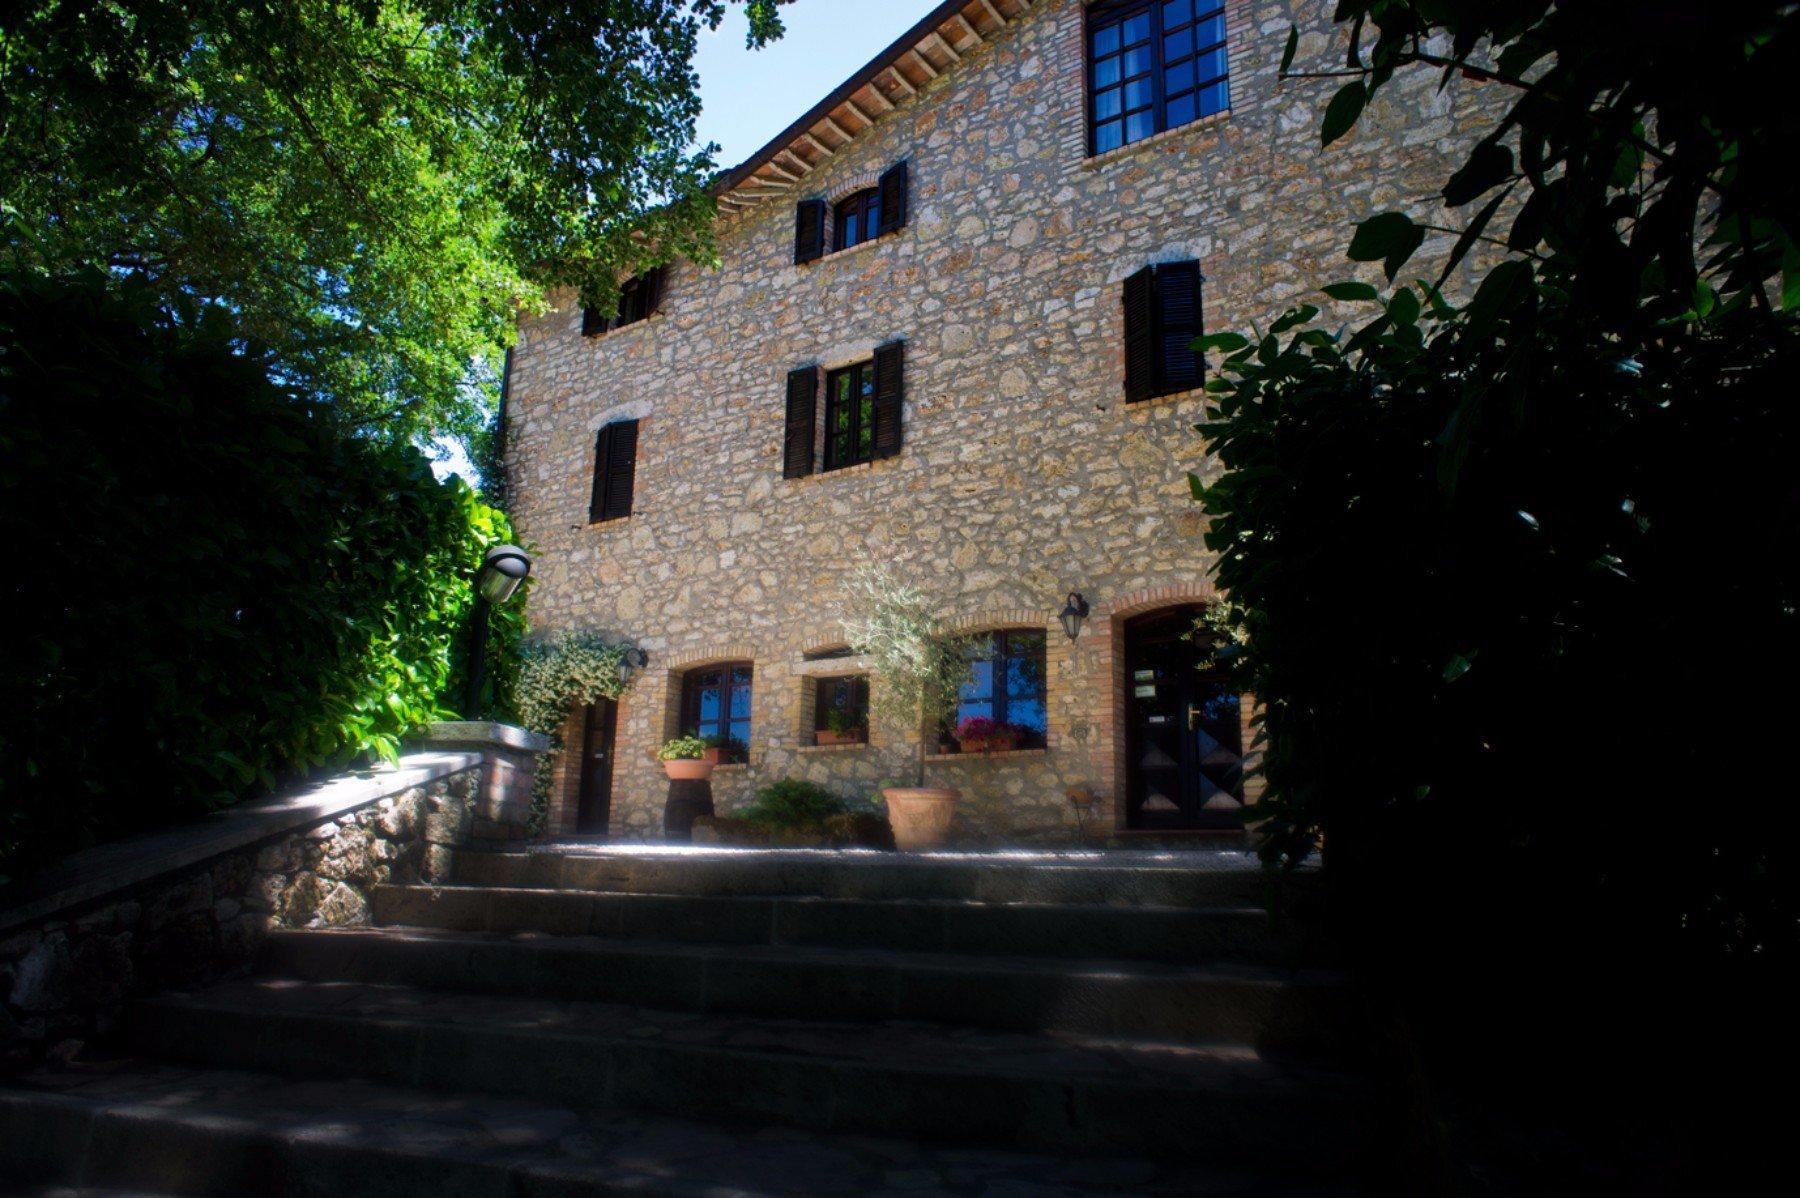 un edificio in pietra